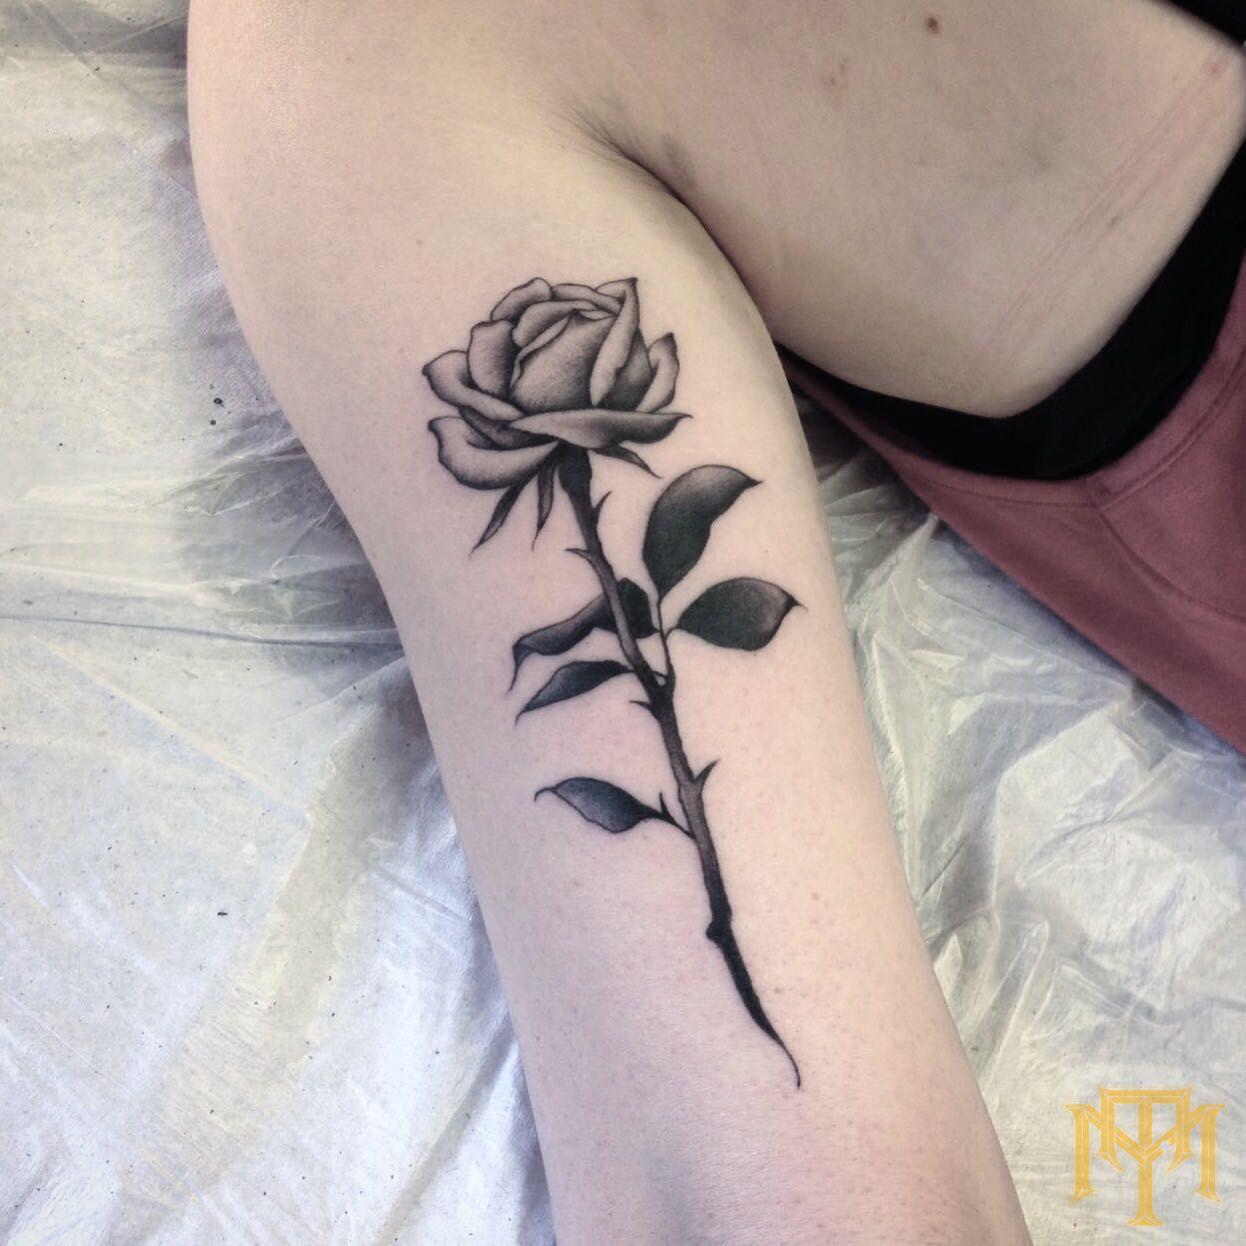 Rose Tattoo By Luke Smith From TRADE MARK Tattoo Durban